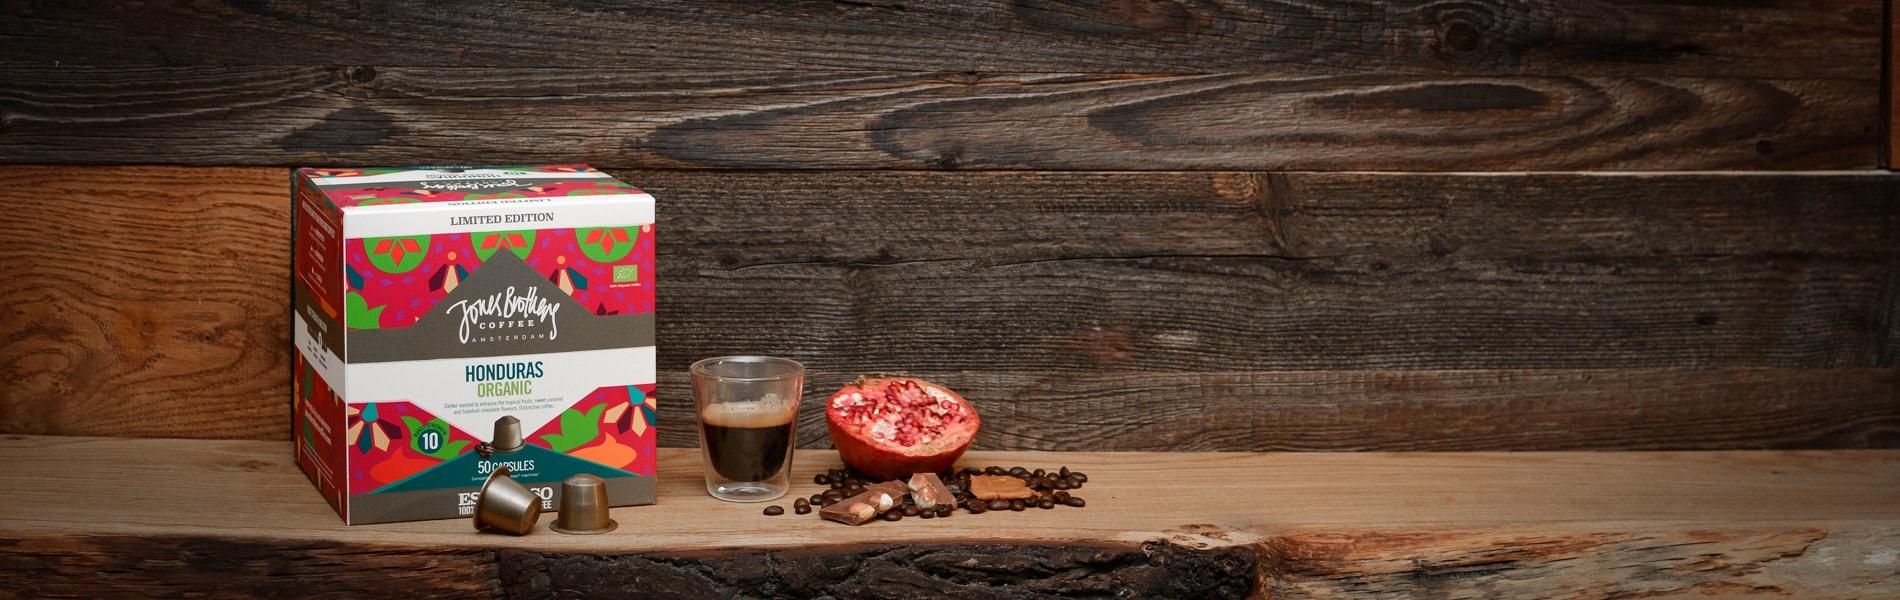 Honduras organic coffee 50x capsules | Jones Brothers Coffee